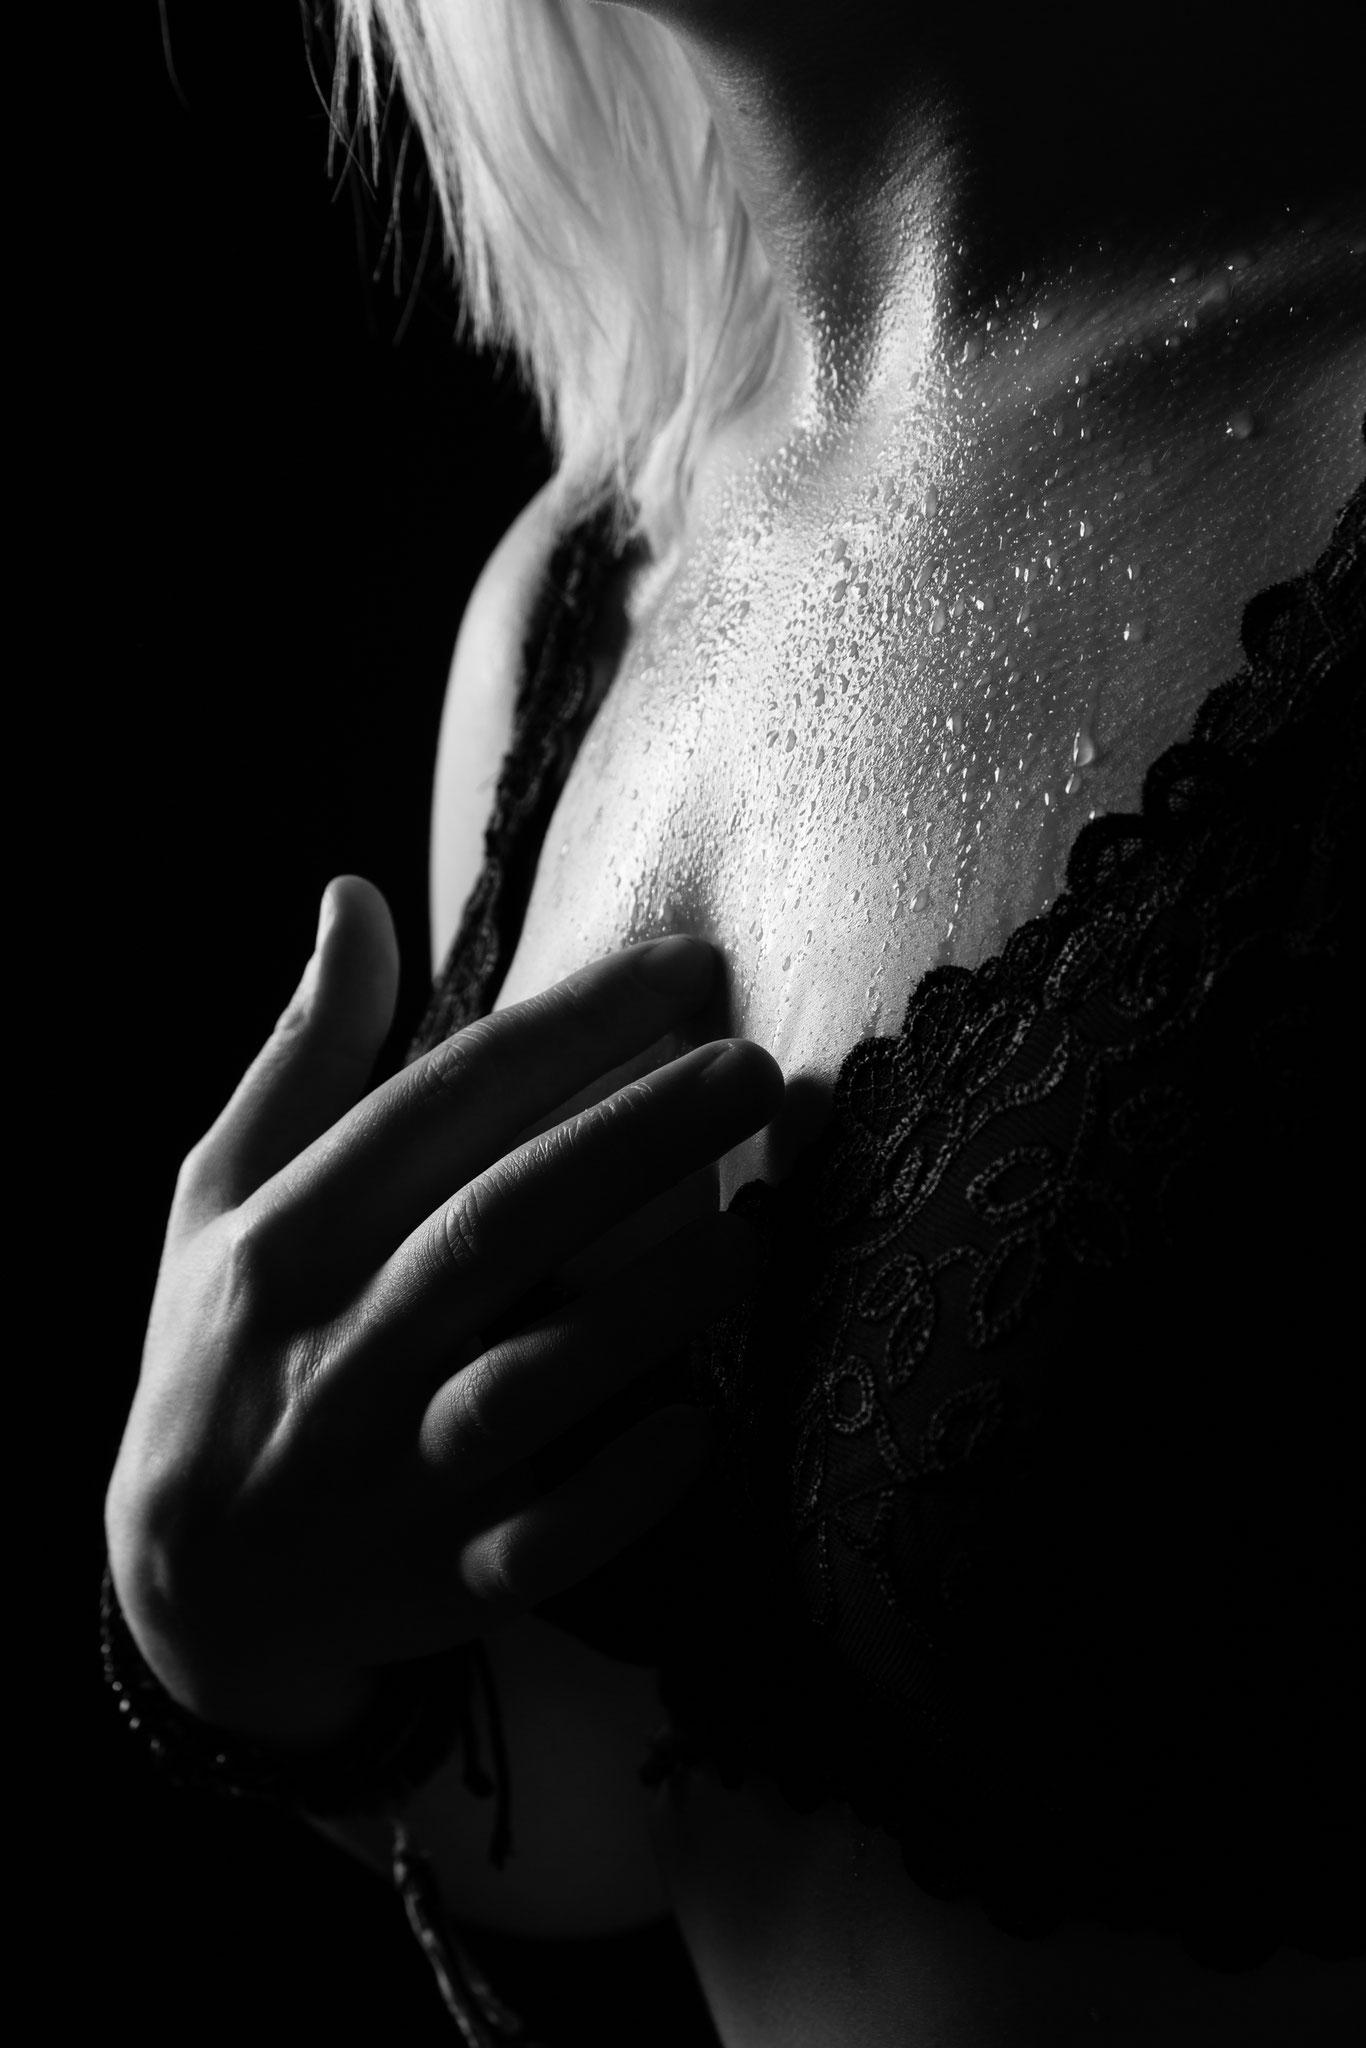 Feuchte wet erotic Photography beim nude-art-photographer aus Erlangen - Unterwäsche Shootings